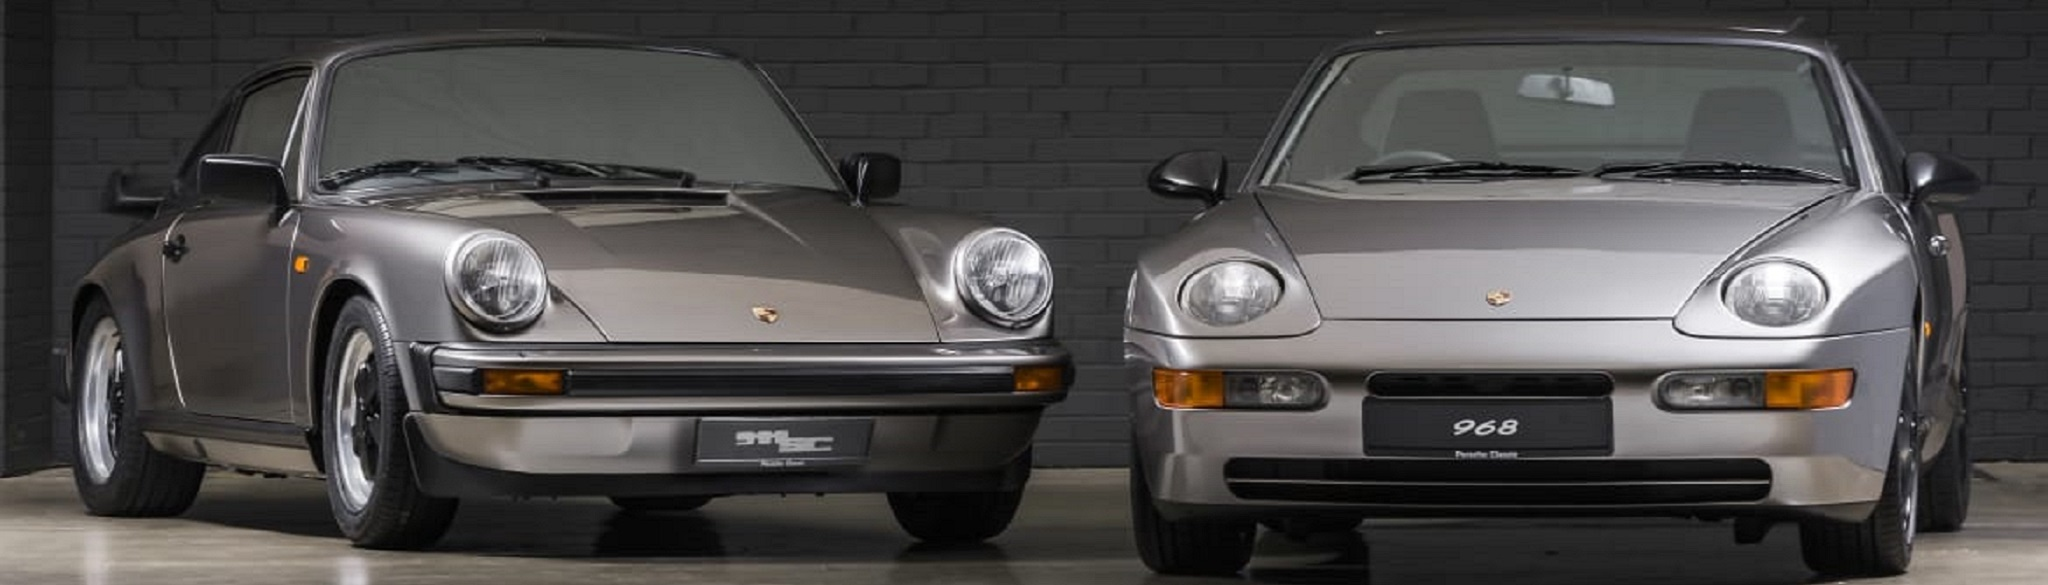 Porsche 911 SC   1982 and 968 Sport   1996